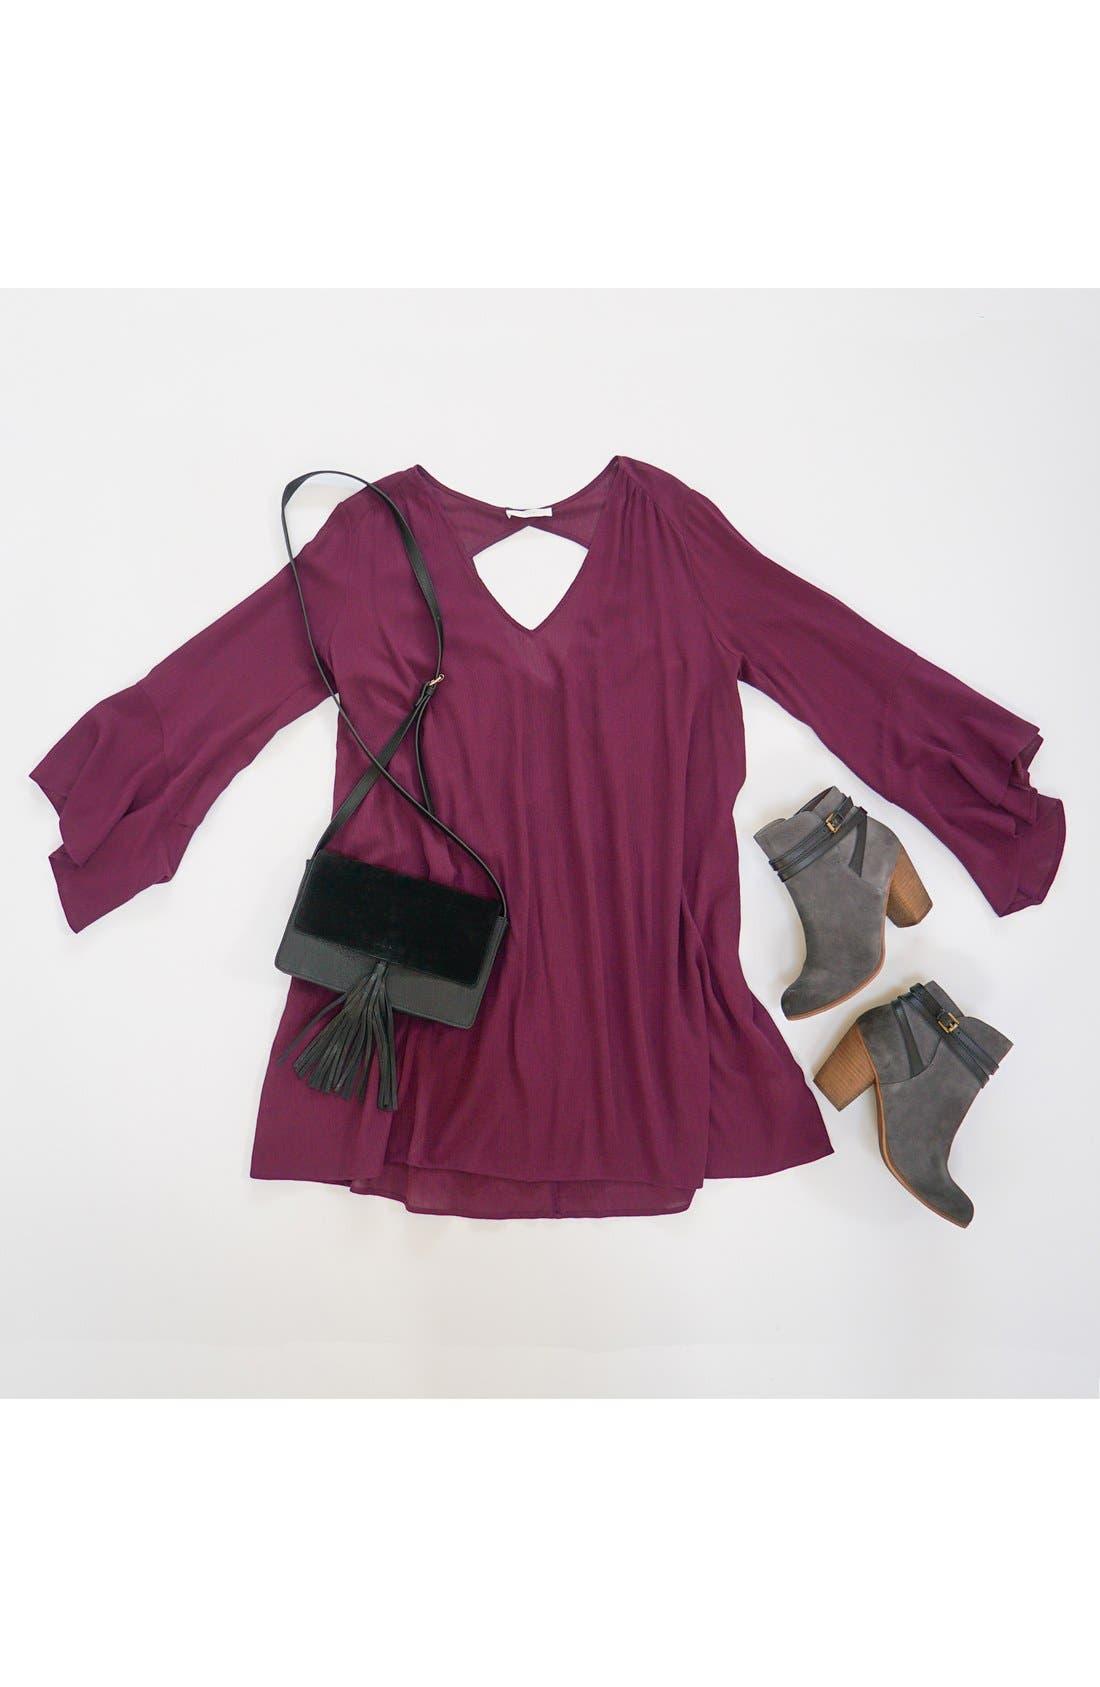 BP., Tassel Faux Leather Crossbody Bag, Main thumbnail 1, color, 285